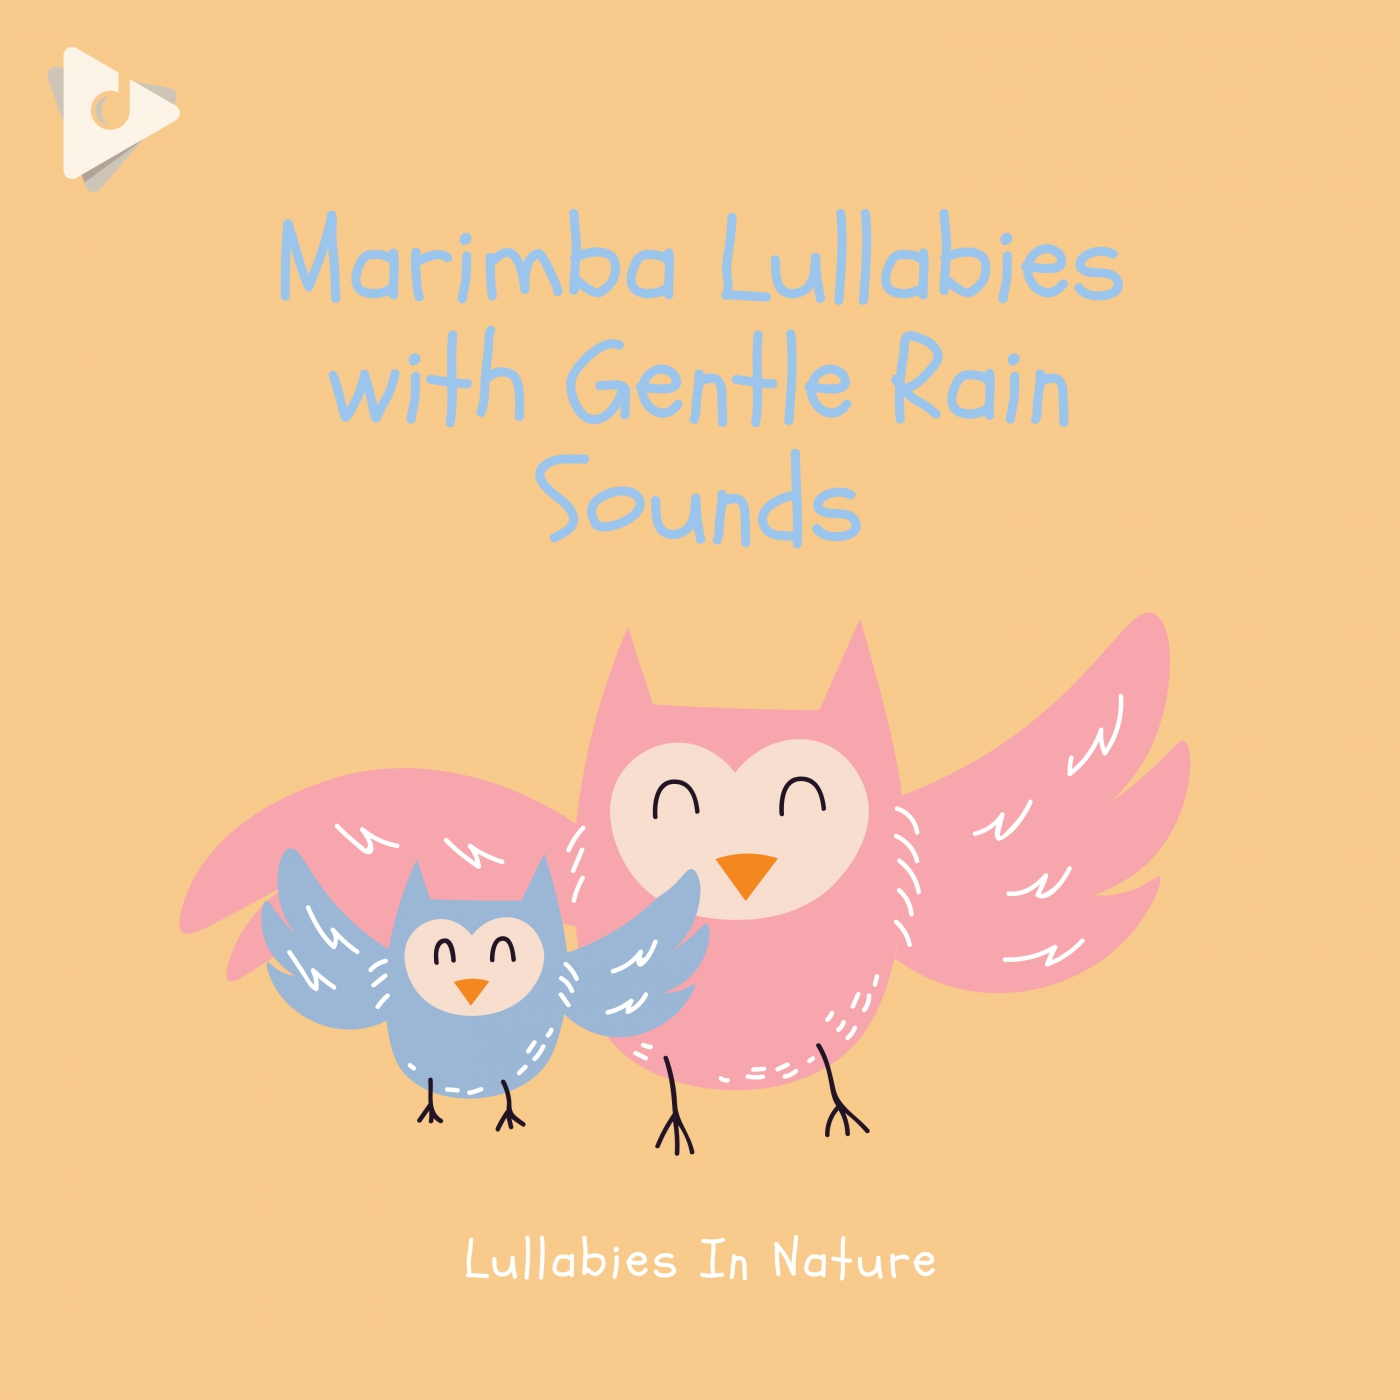 Marimba Lullabies with Gentle Rain Sounds